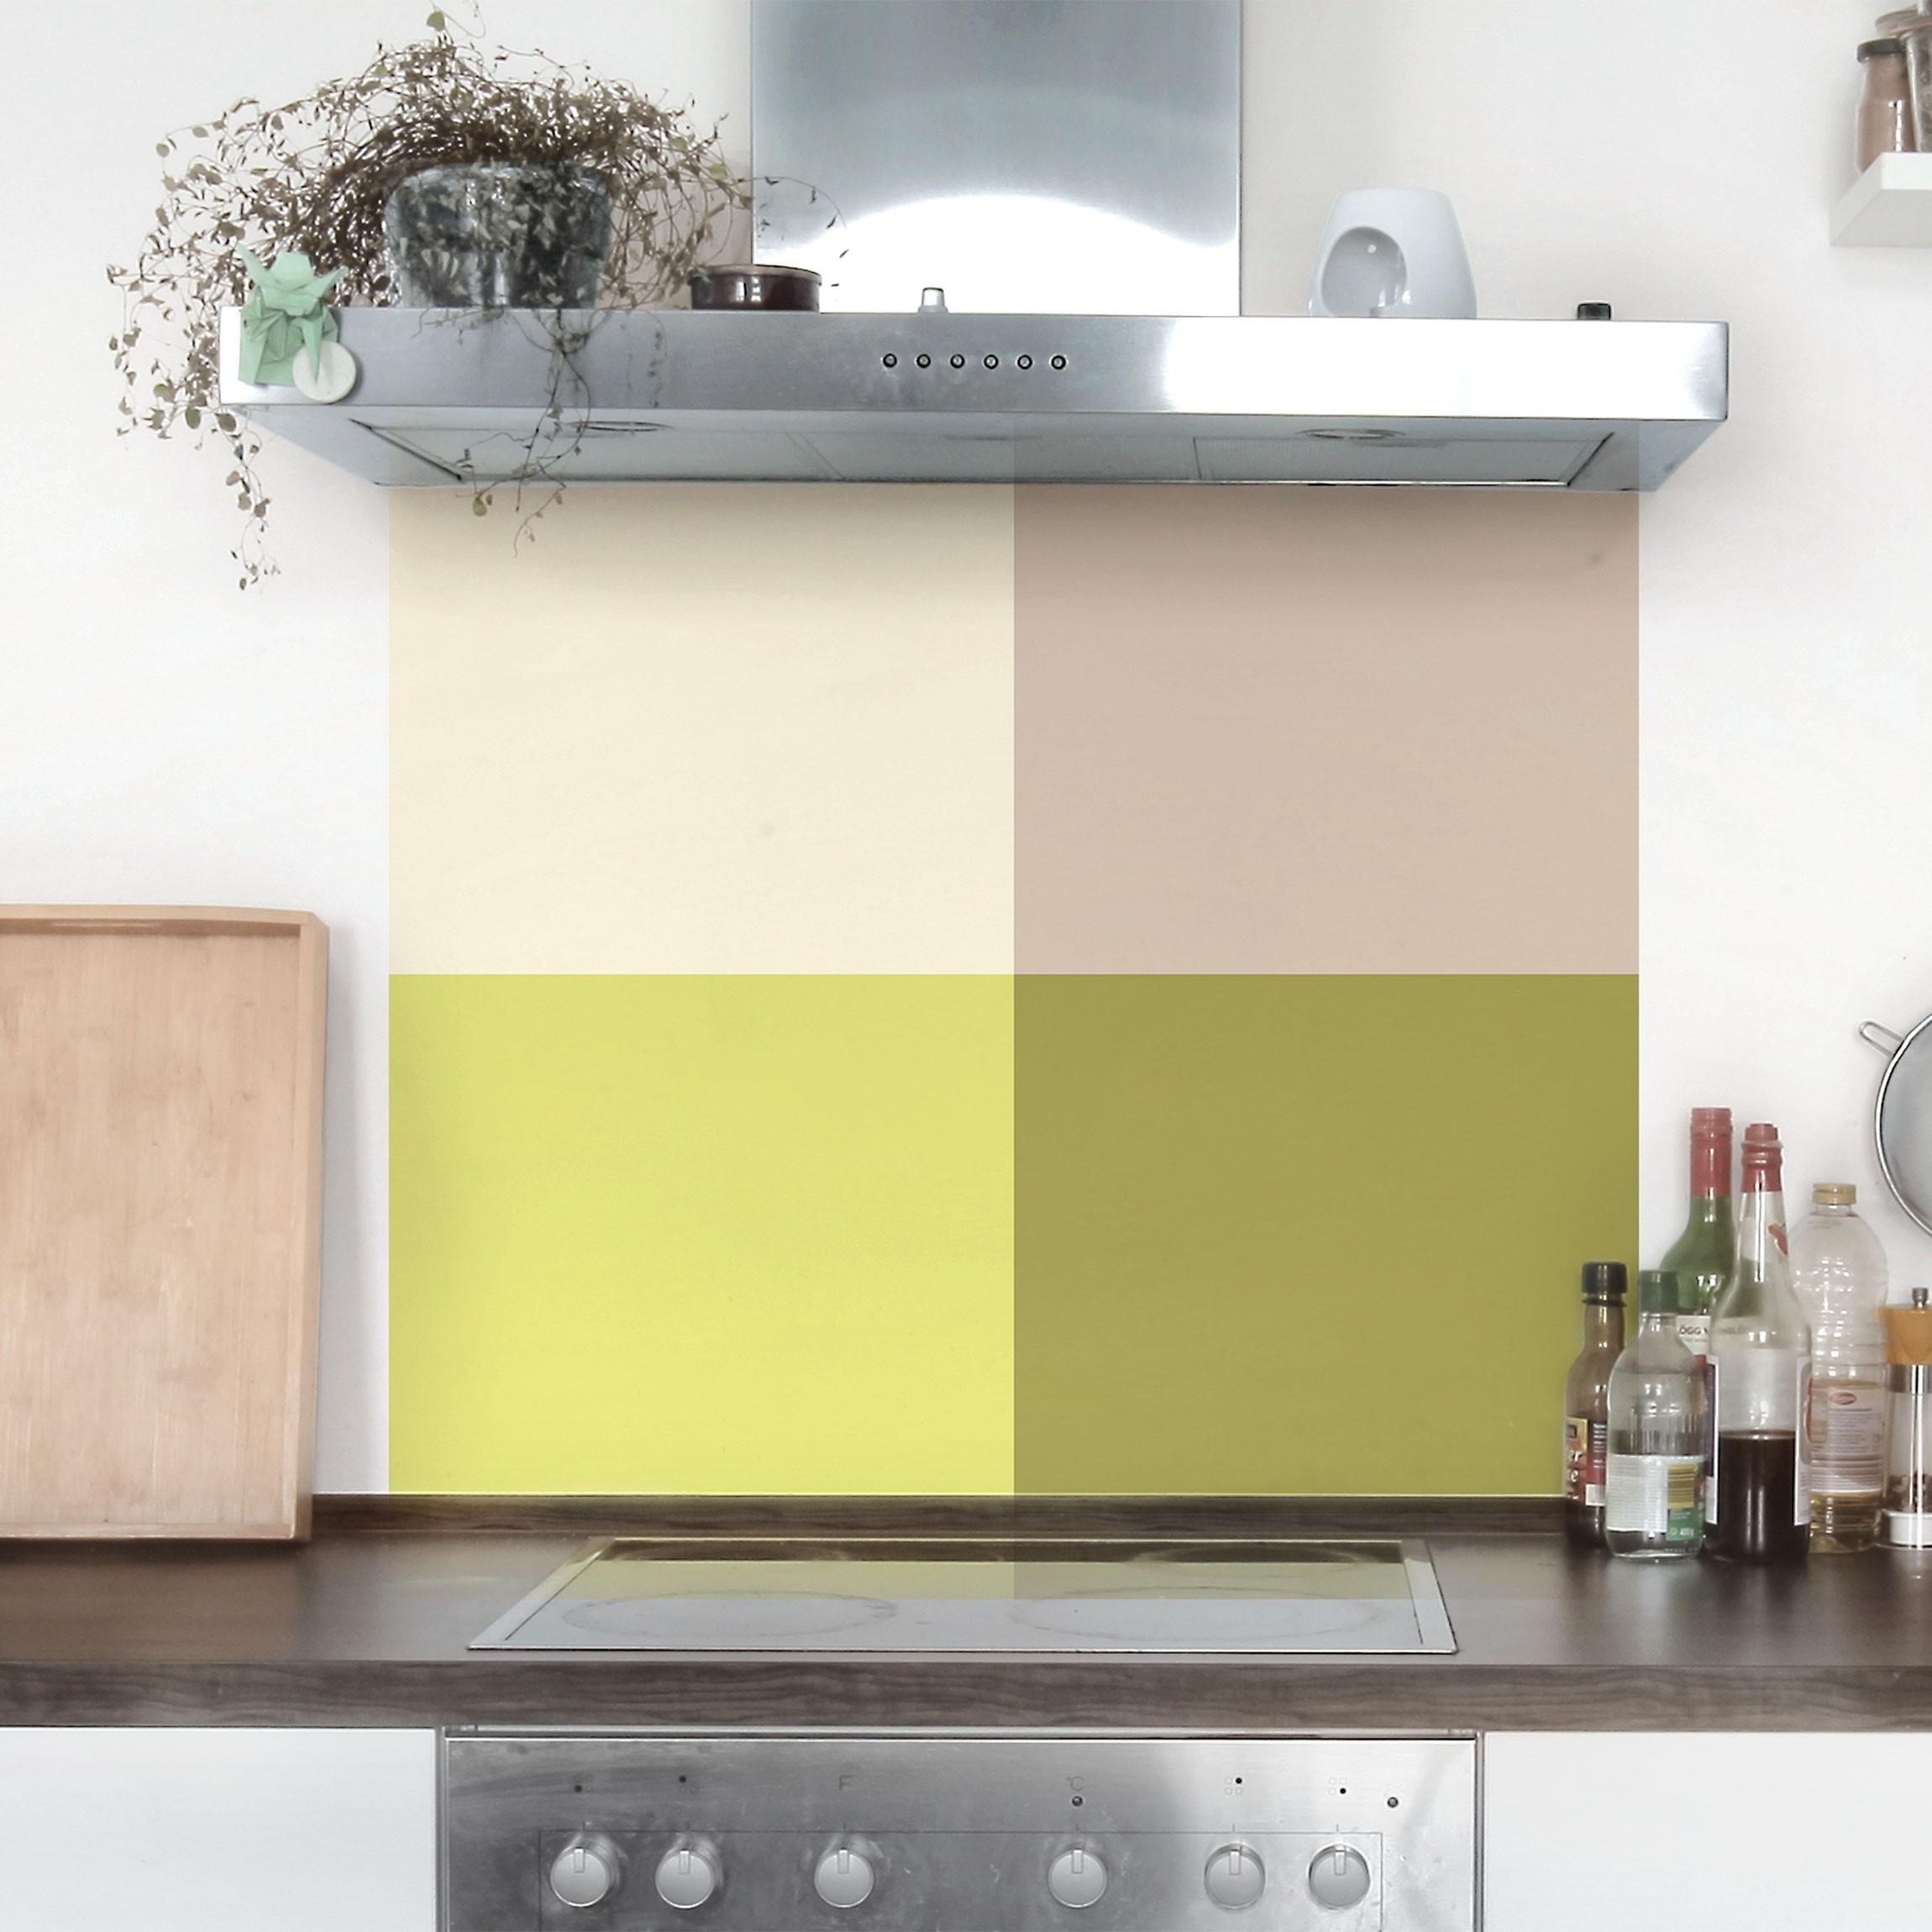 Klebefolie Küche Set - Frühlingsfrische Farben - Kaschmir Macchiato  Pastellgrün Bambus